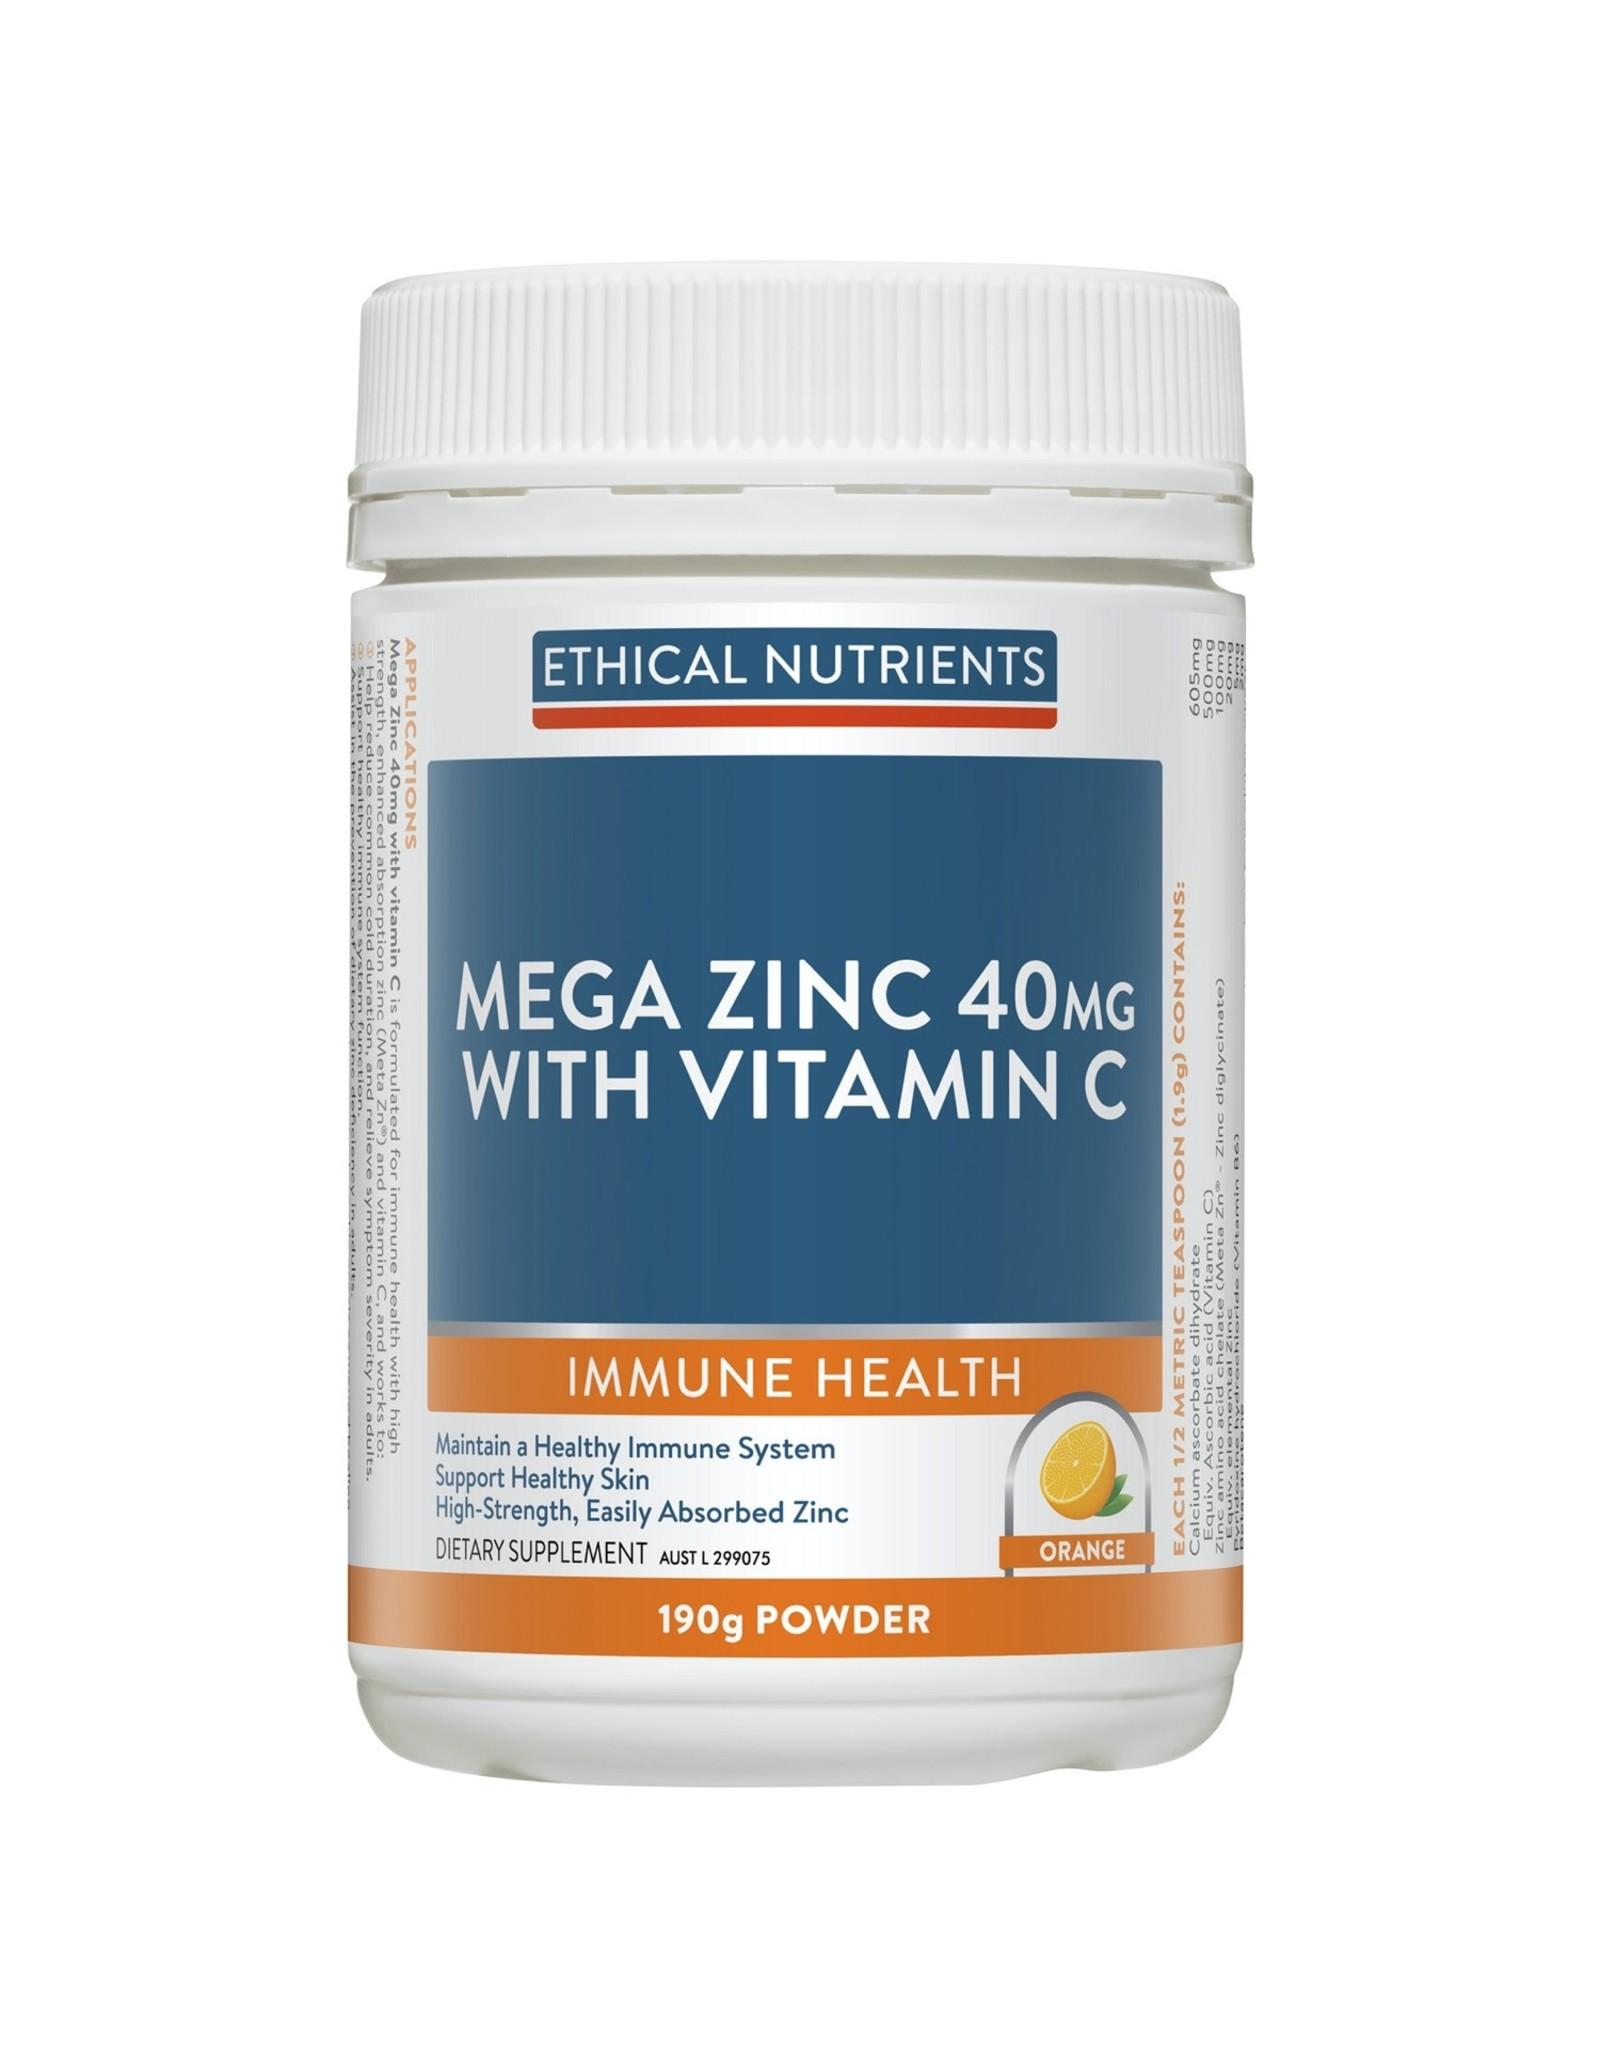 Ethical Nutrients Mega Zinc 40mg Powder With Vitamin C